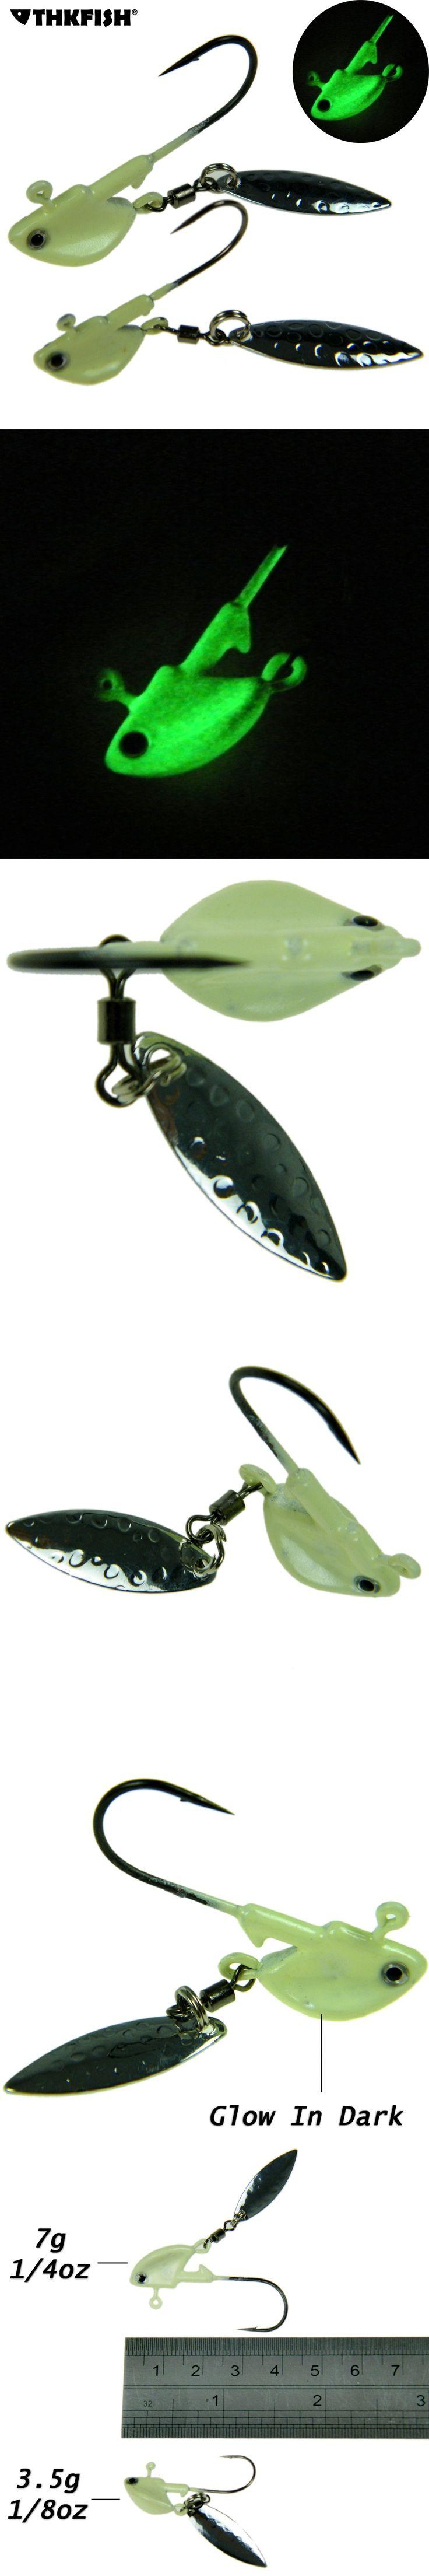 10Pcs 3.5g 7g 10g Glow Fishing Jigs Lure Metal Spoons Spinner Glow Luminous Lead Jig Heads Hooks Fishing Lures Pesca Hard Baits